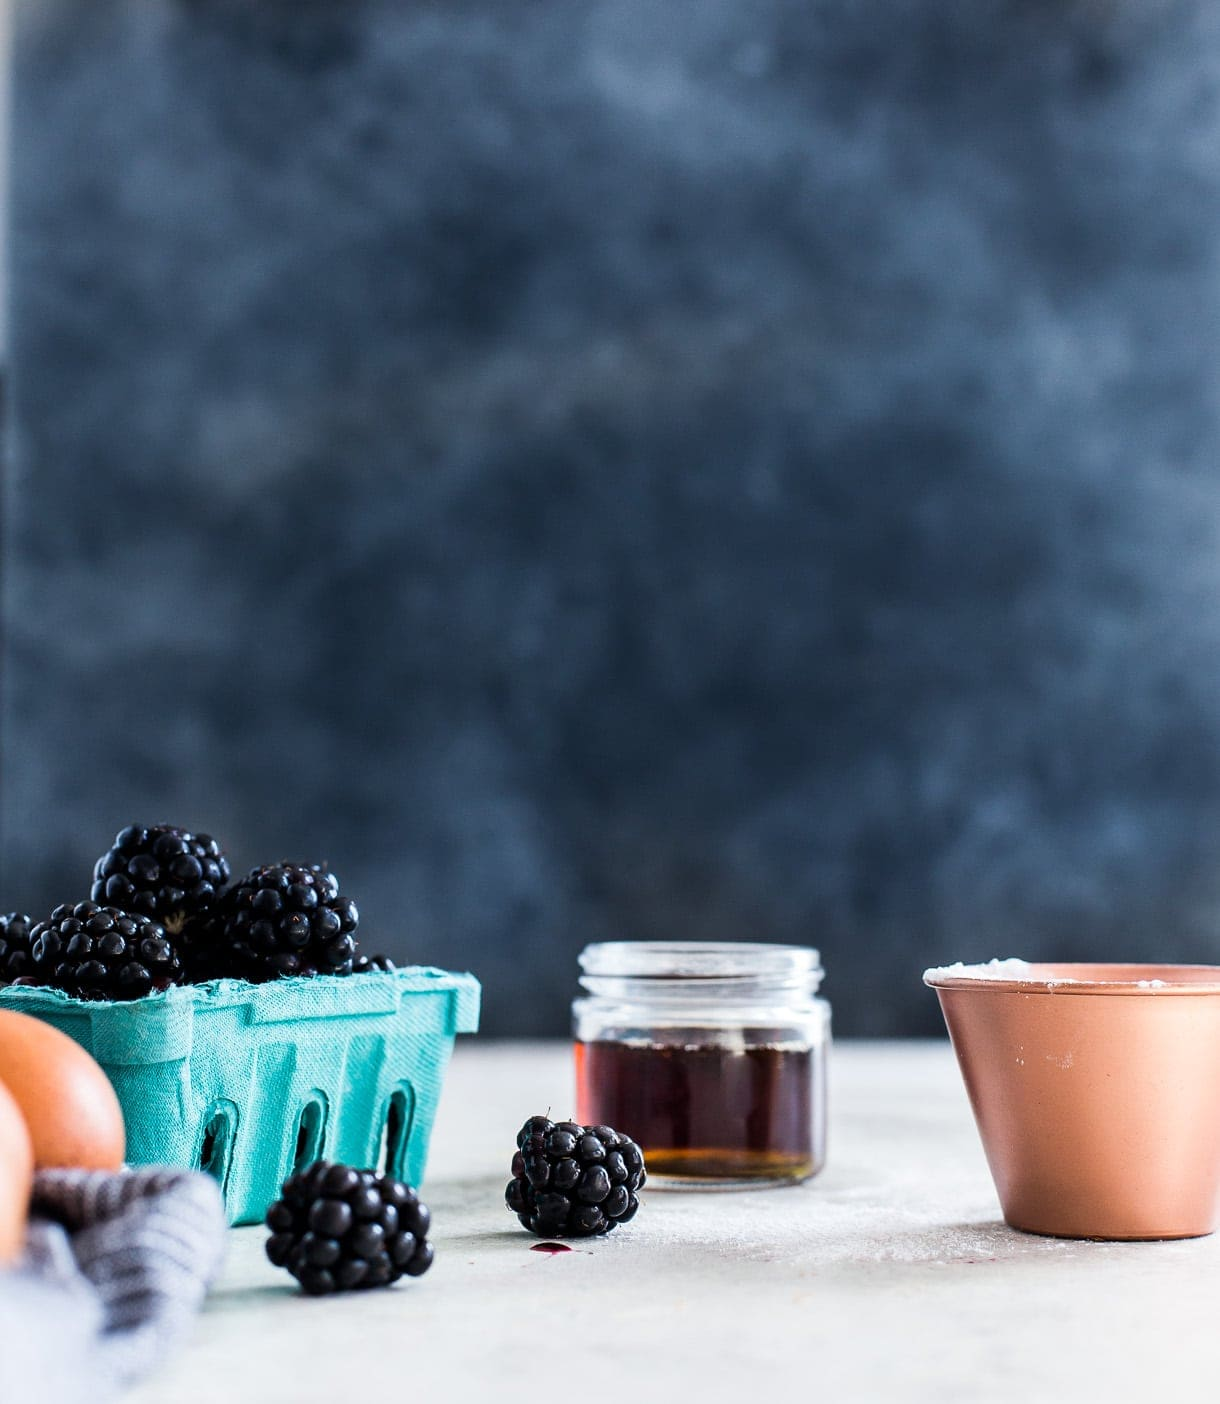 Blackberry Baked Custard {a cross between a pudding and claufoutis}